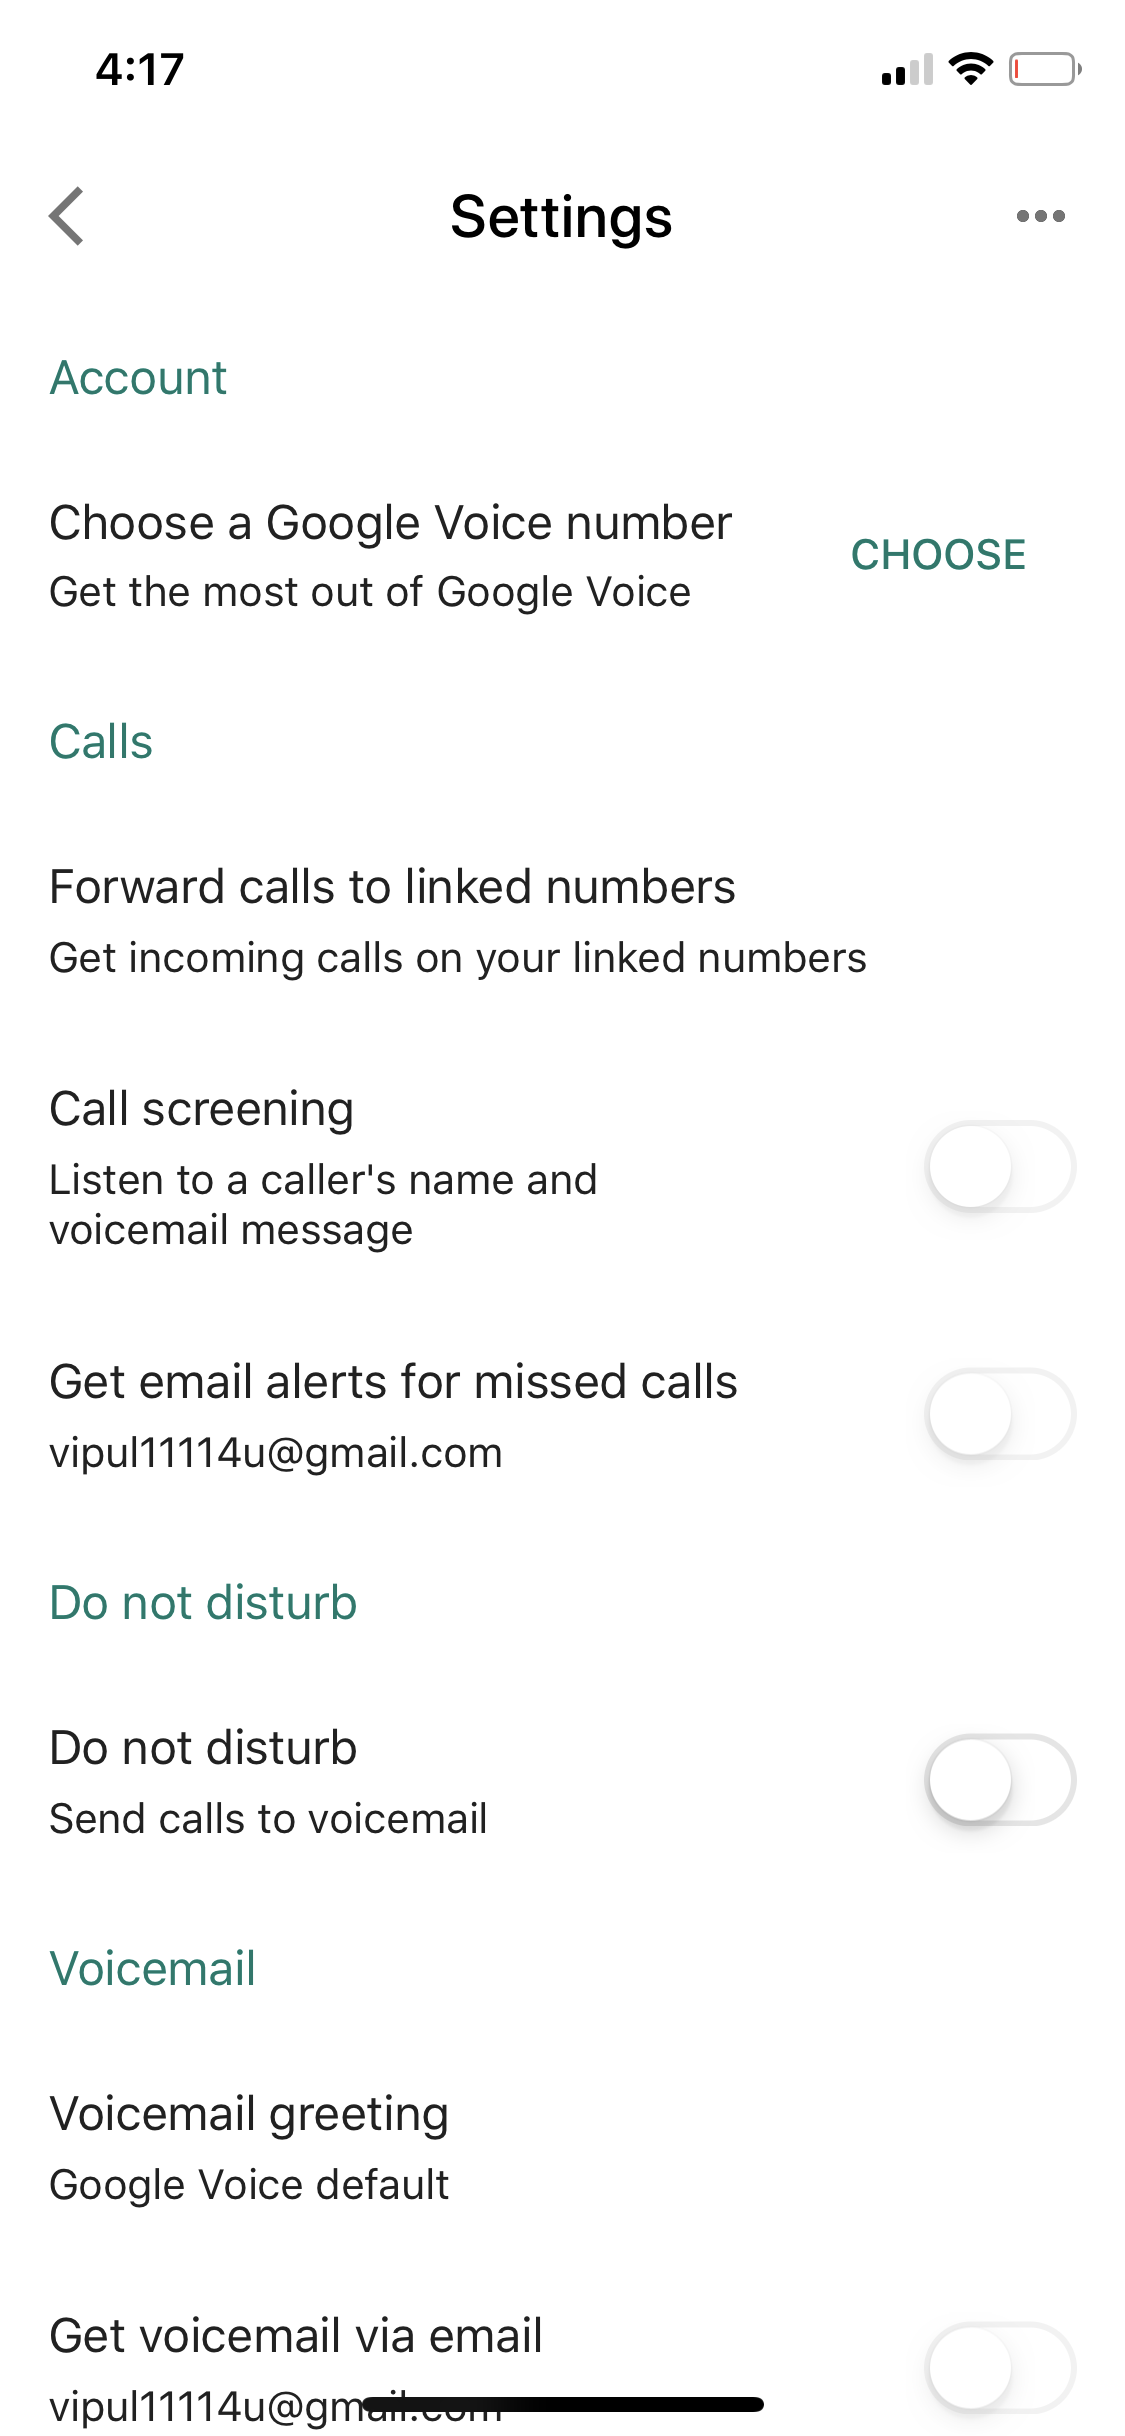 Unable to retrieve my google voice number - Google Voice Help